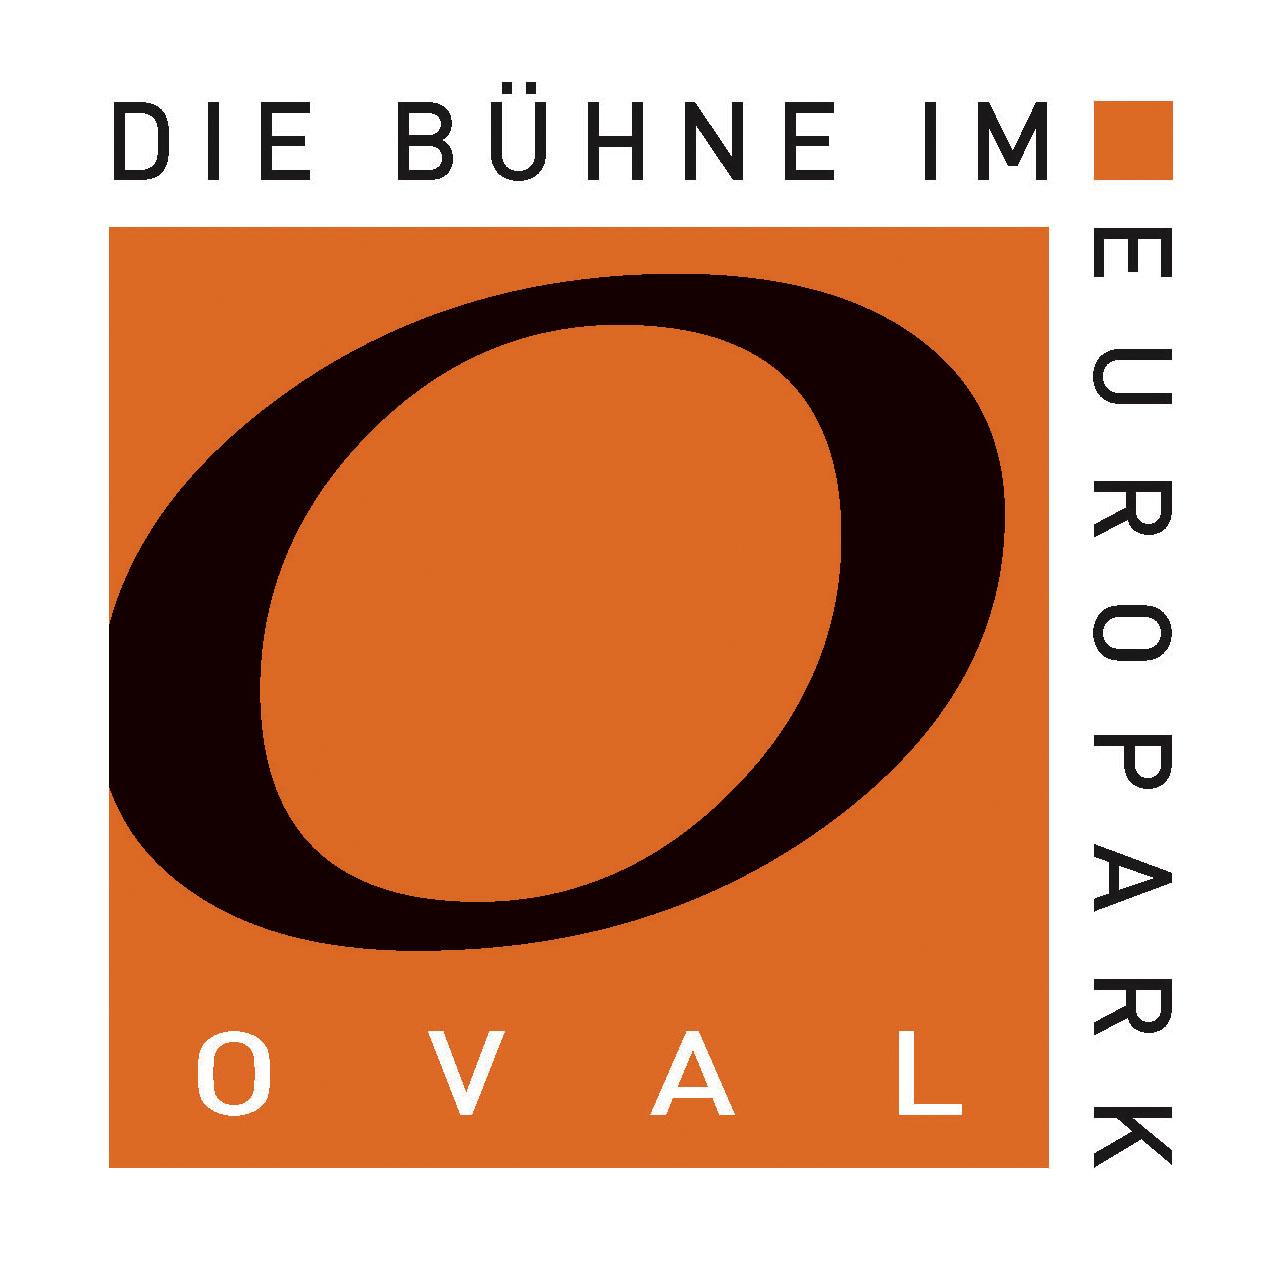 OVAL, Salzburg Logo